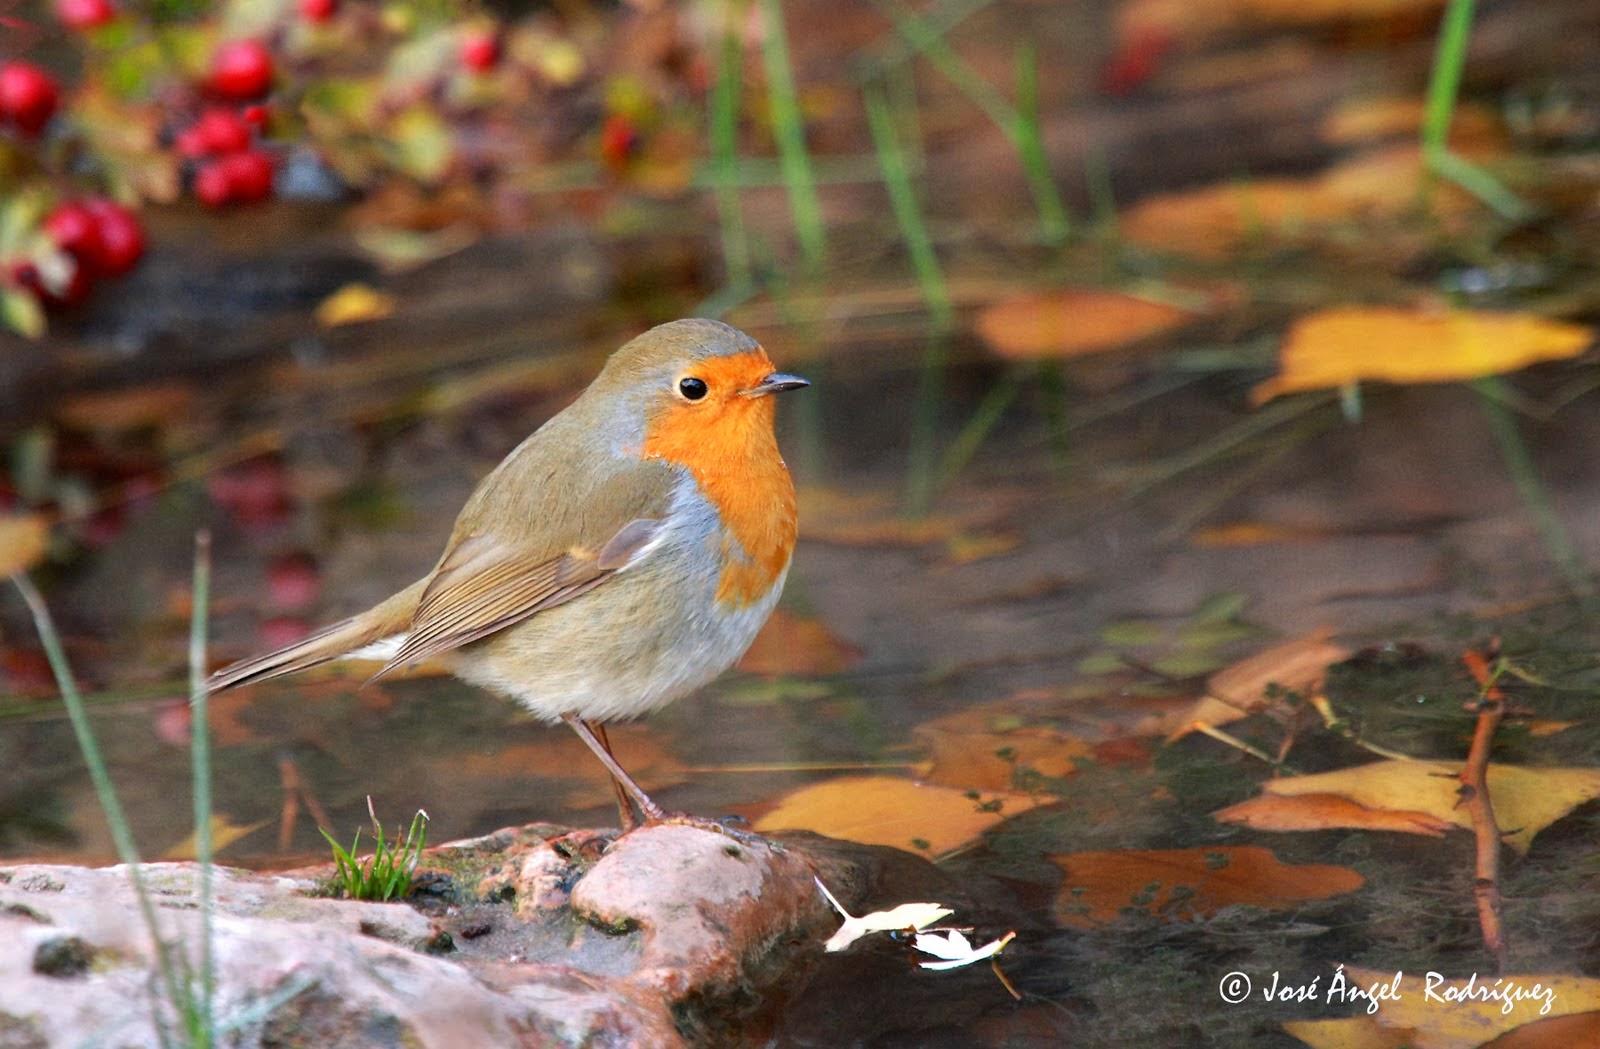 Fuente de la imagen: http://fotosjoseangelrodriguez.blogspot.com.es/2010/11/aves-en-otono-birds-in-autumn.html